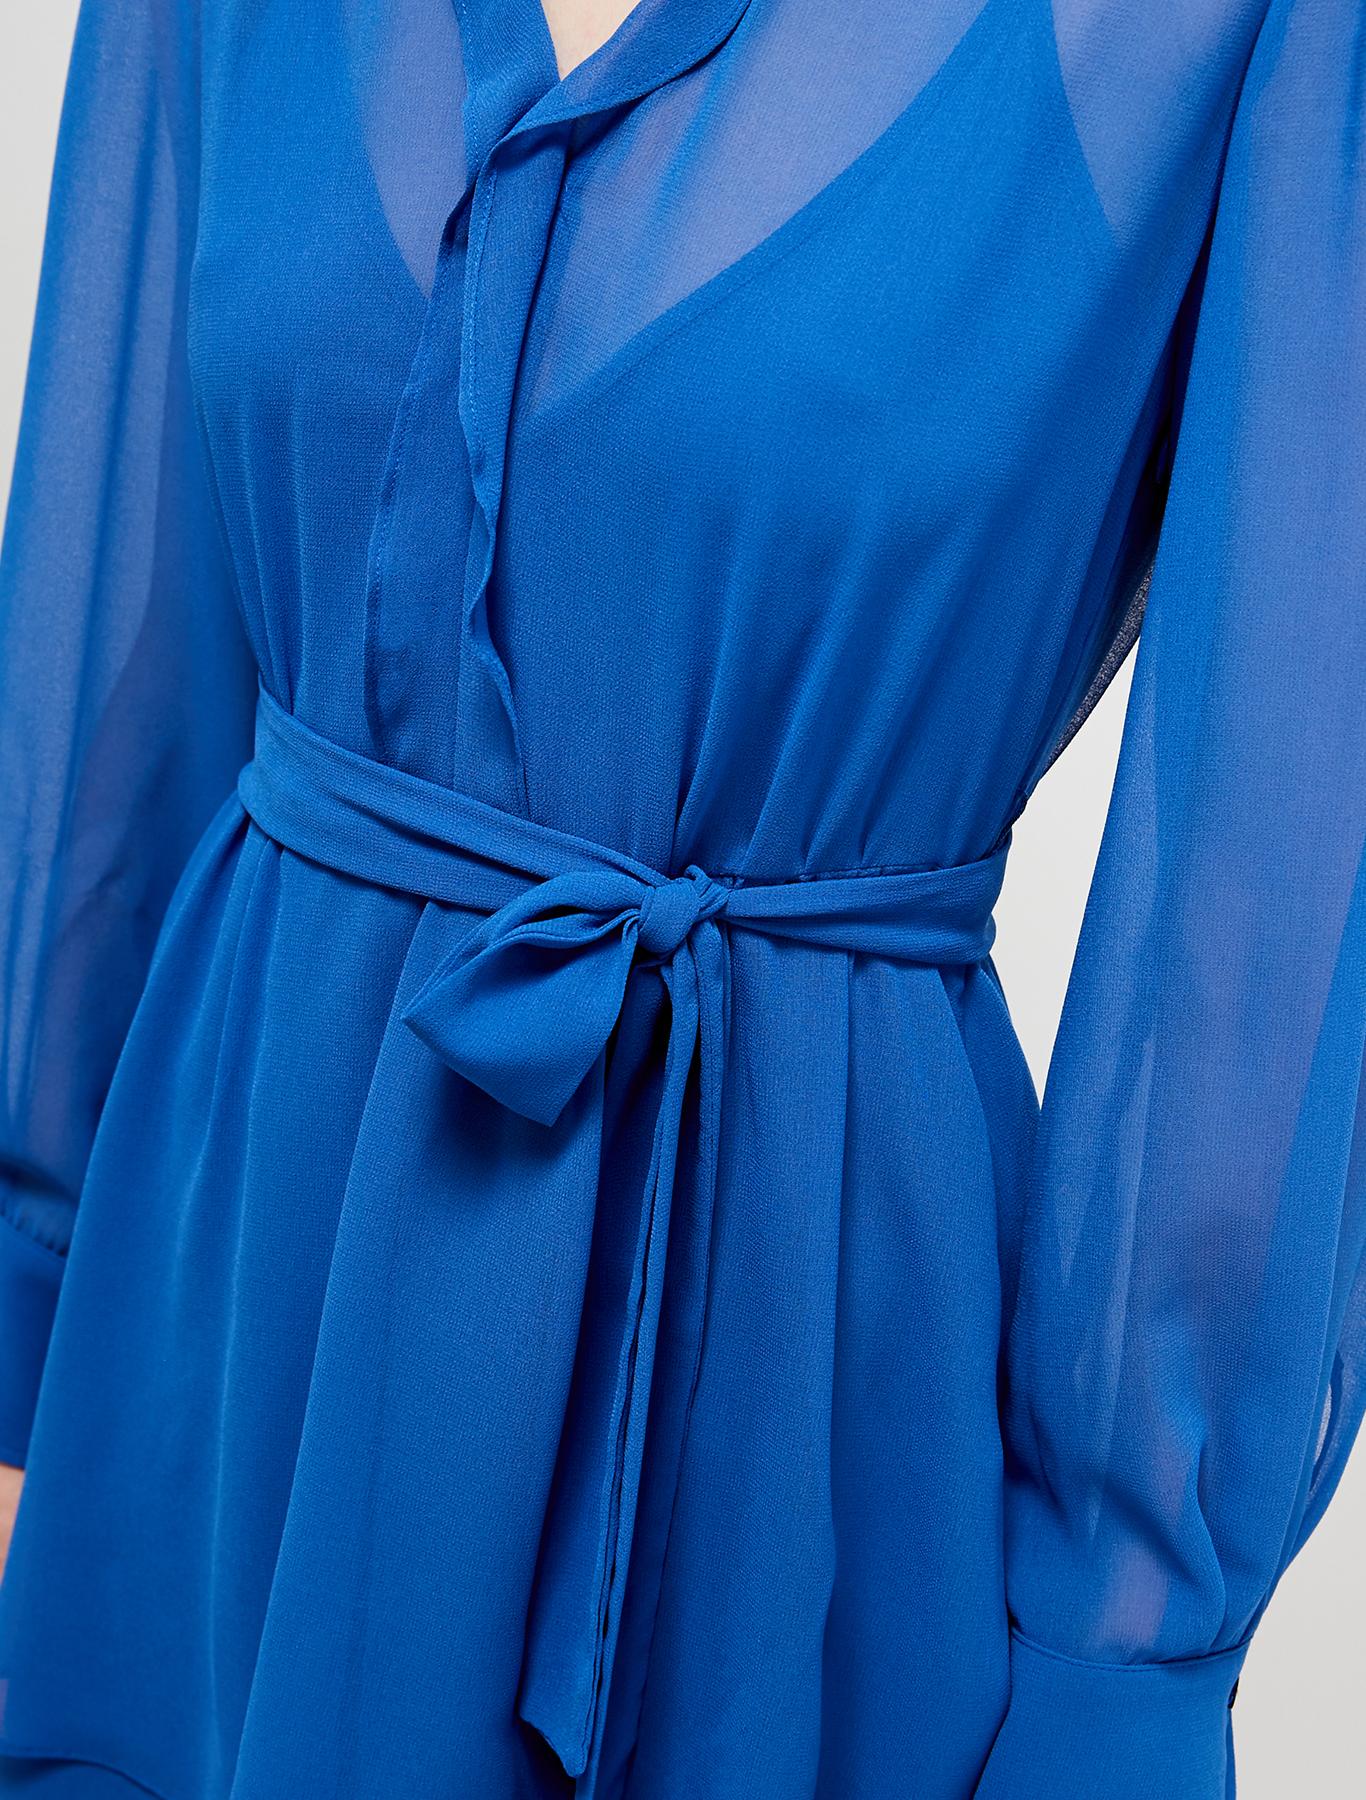 Flounced georgette dress - air force blue - pennyblack